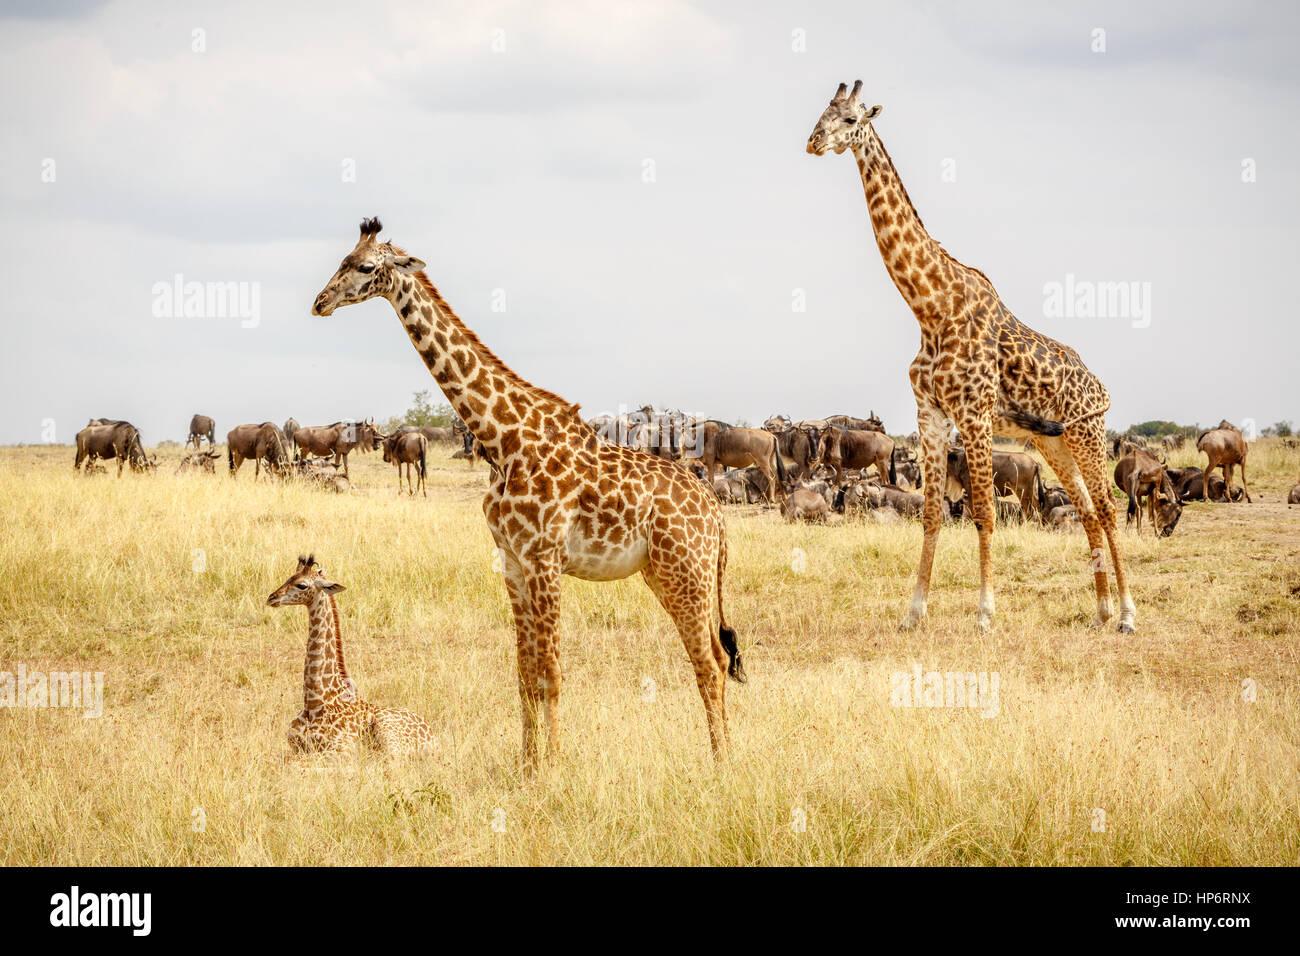 A familiy of Maasai giraffes with calf, Maasai Mara, Kenya - Stock Image